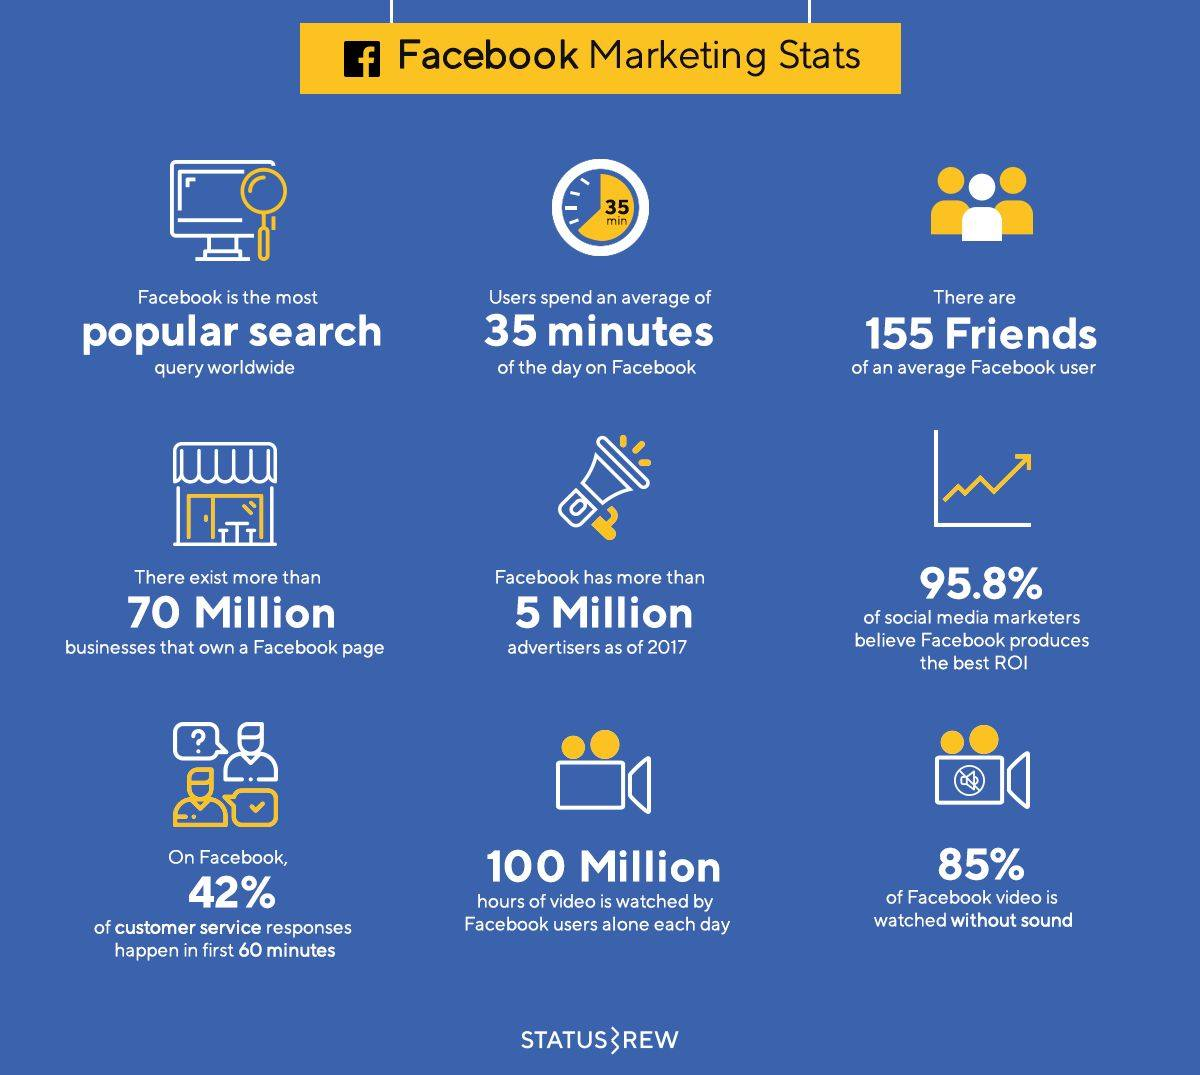 Facebook Marketing Statistics Infographic